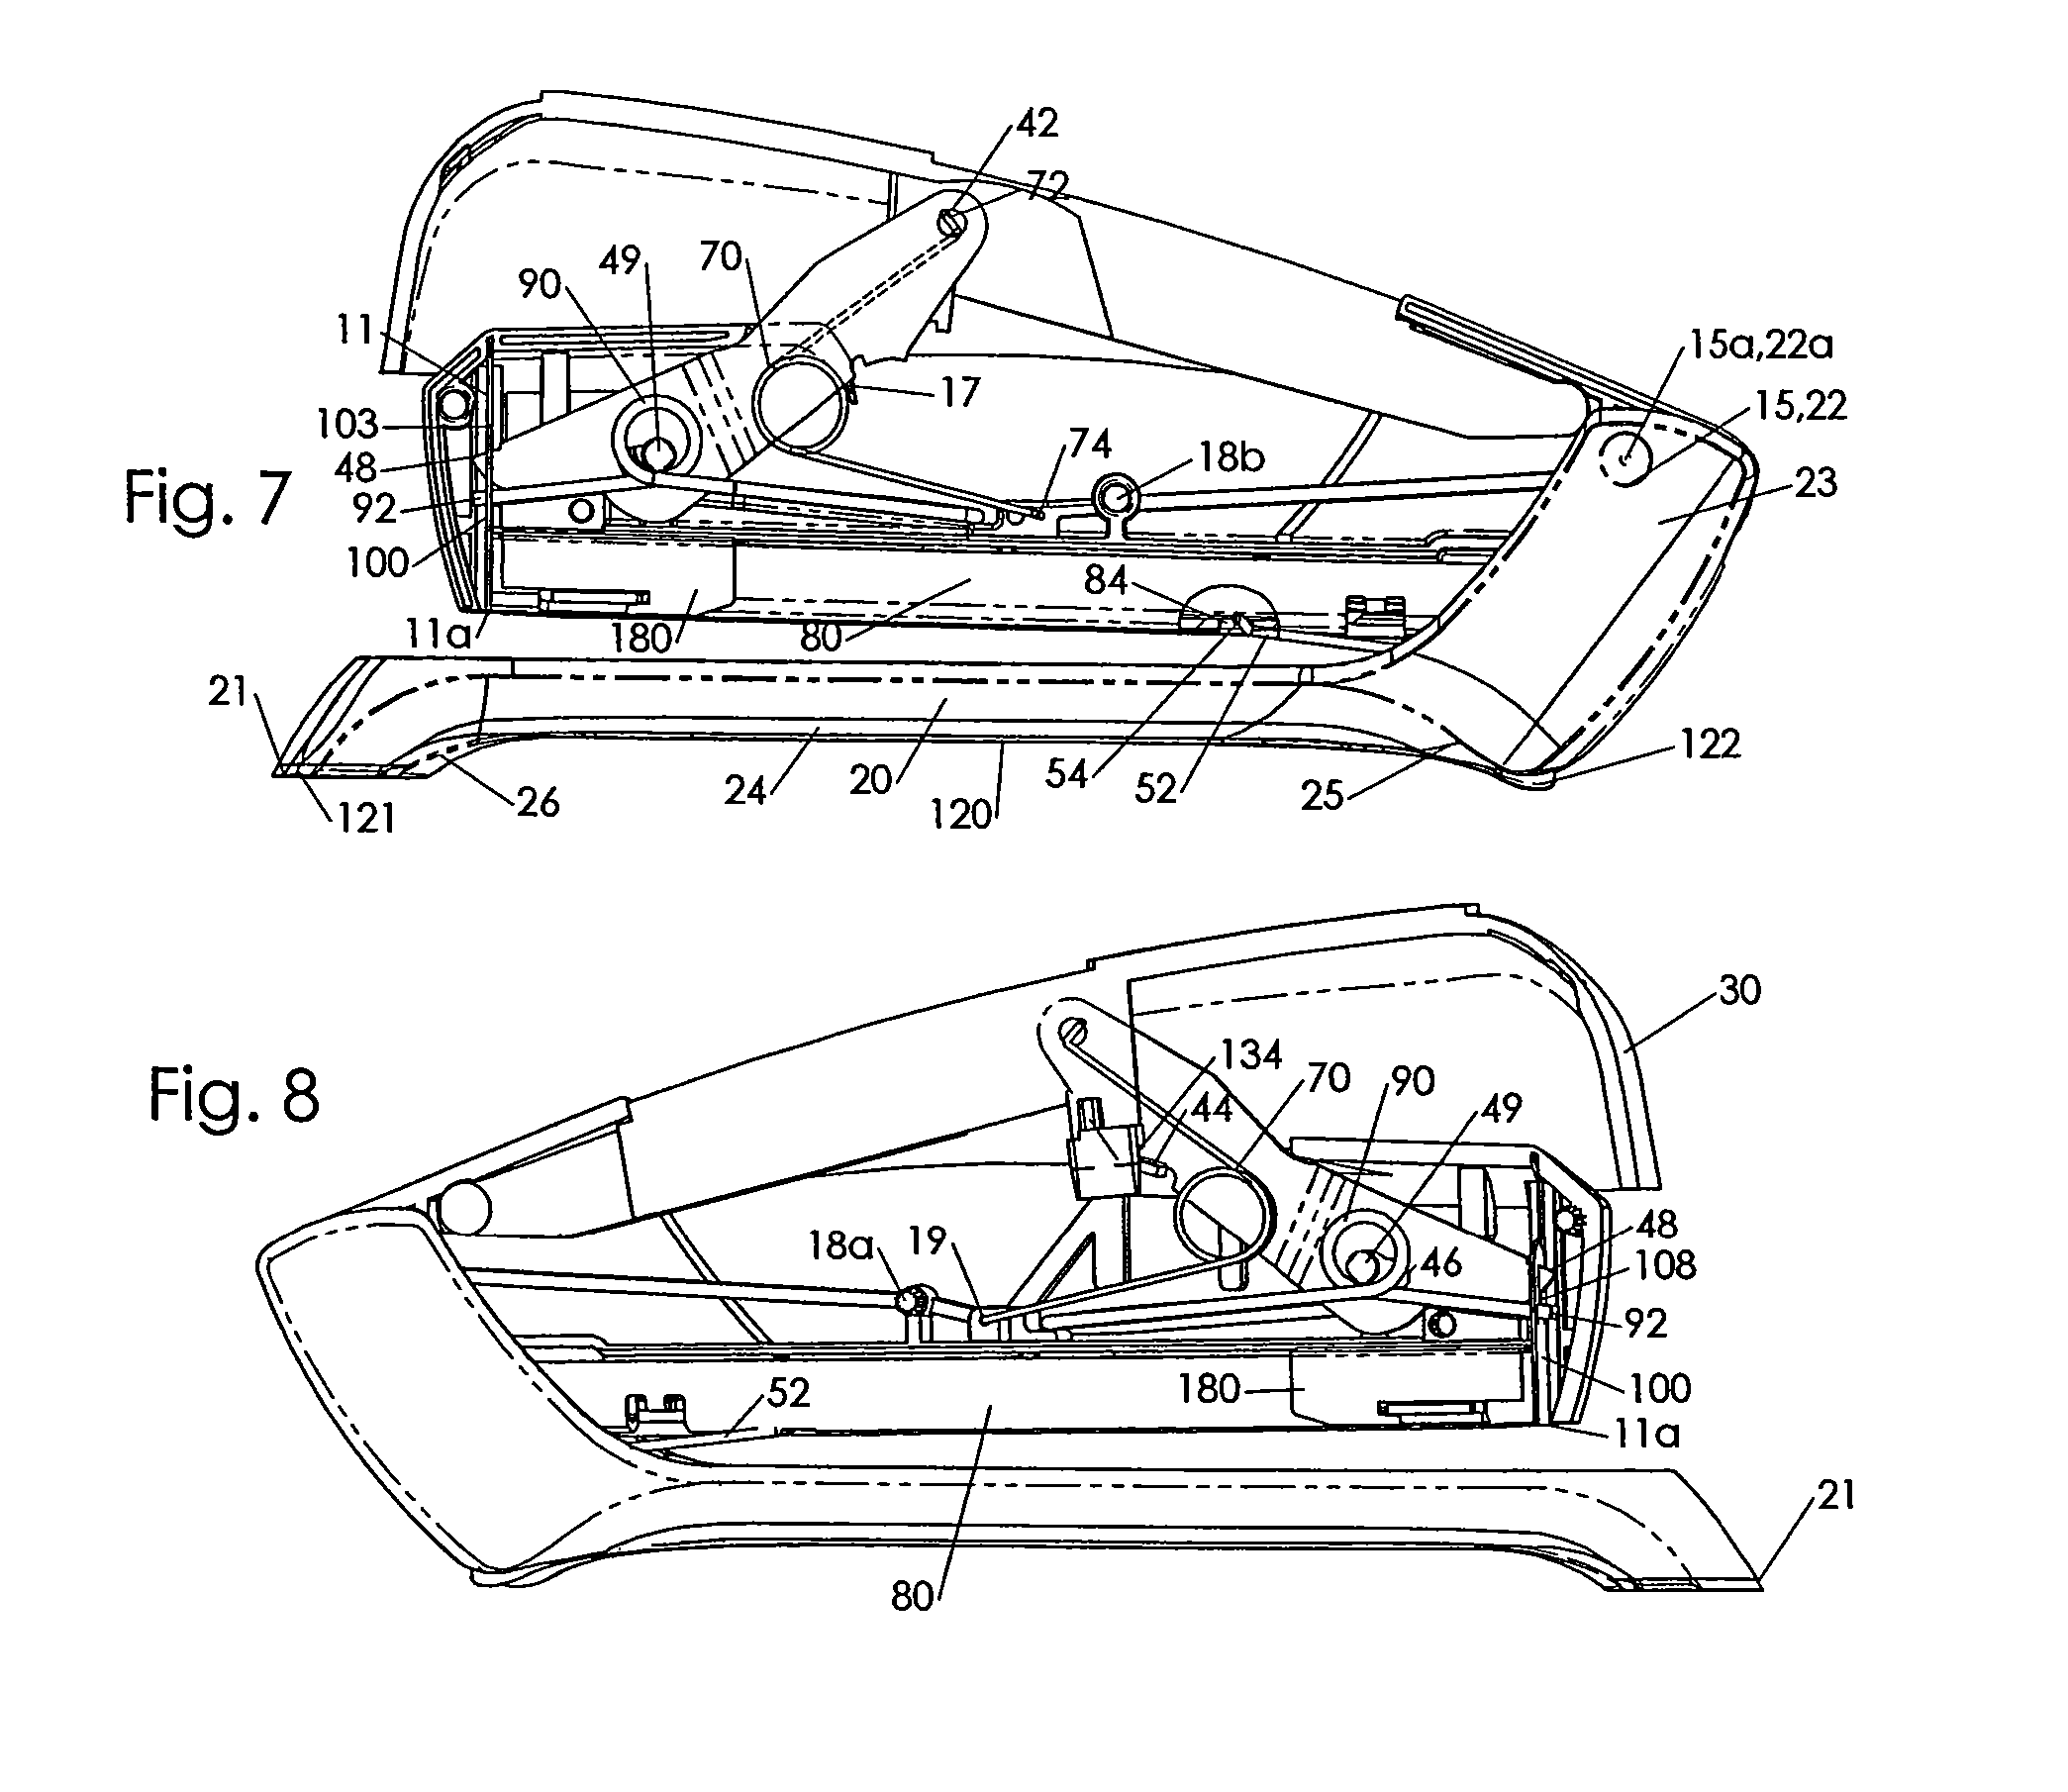 Swingline Stapler Repair Diagram Pictures To Pin On